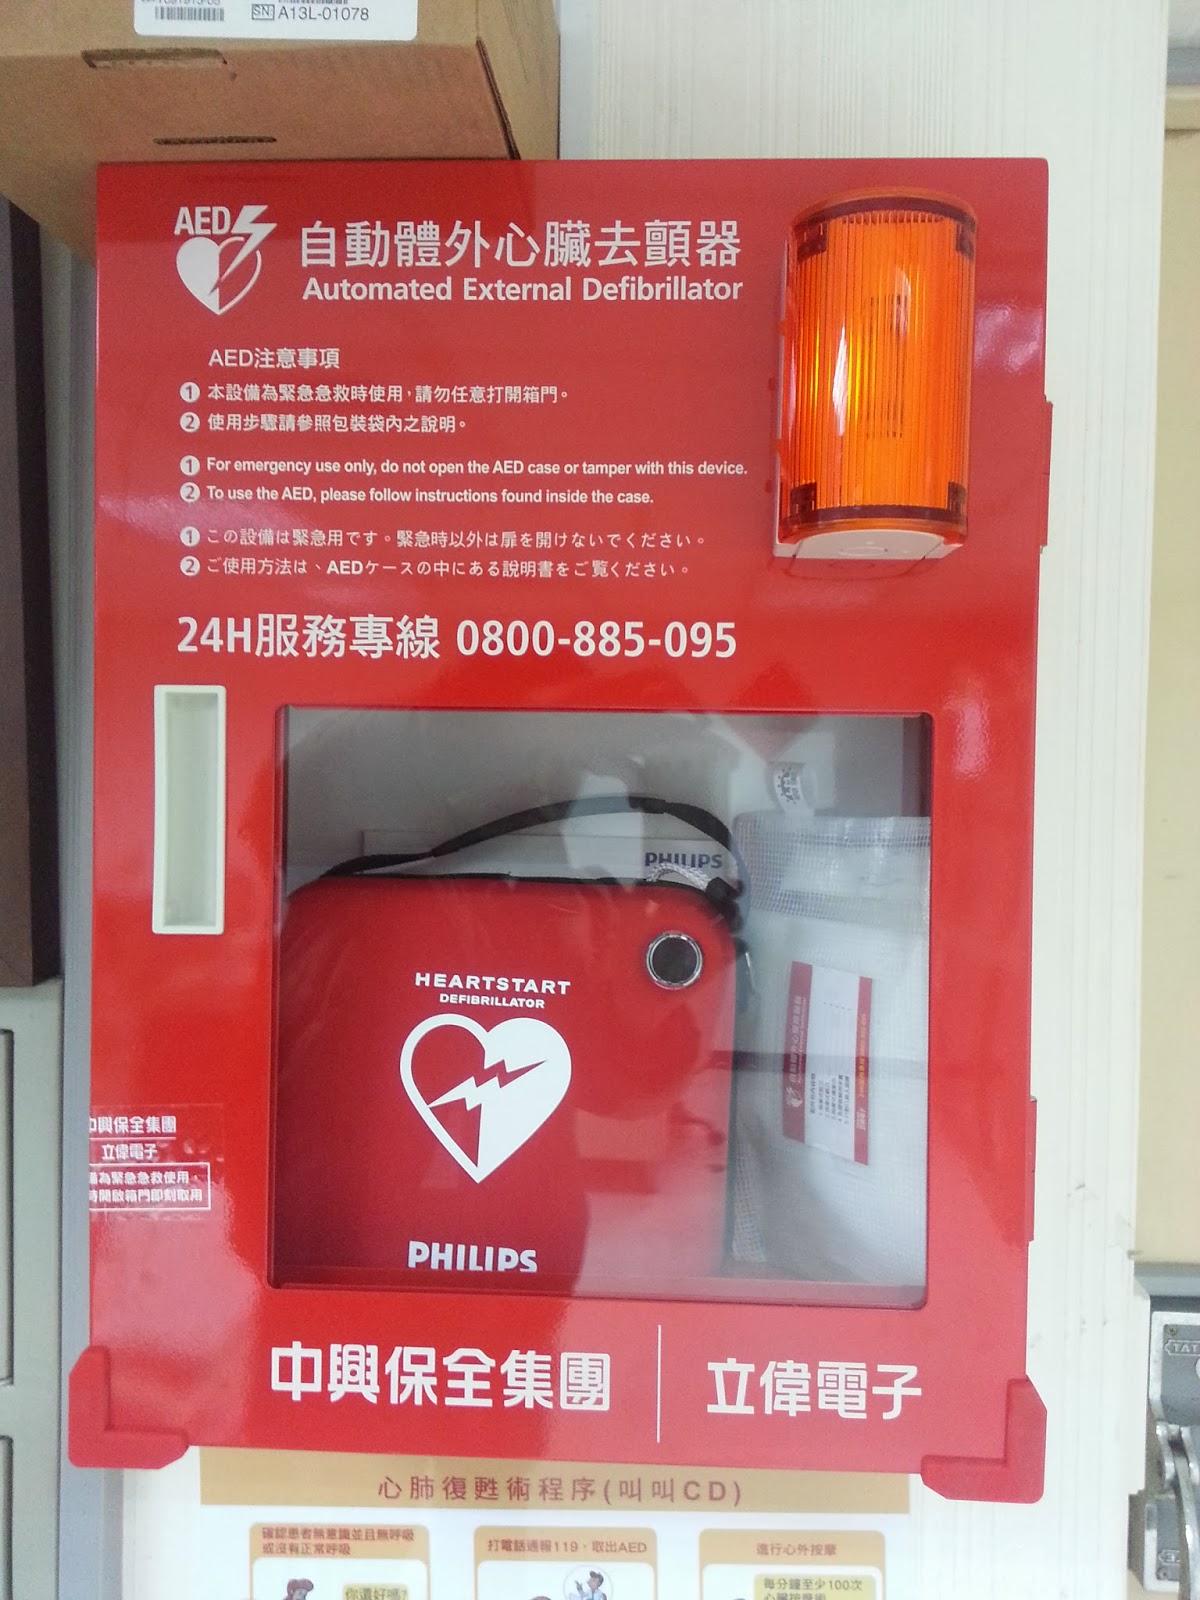 Arthur's simple life 我的淡定生活 : 自動體外心臟去顫器(Automated External Defibrillator。AED)